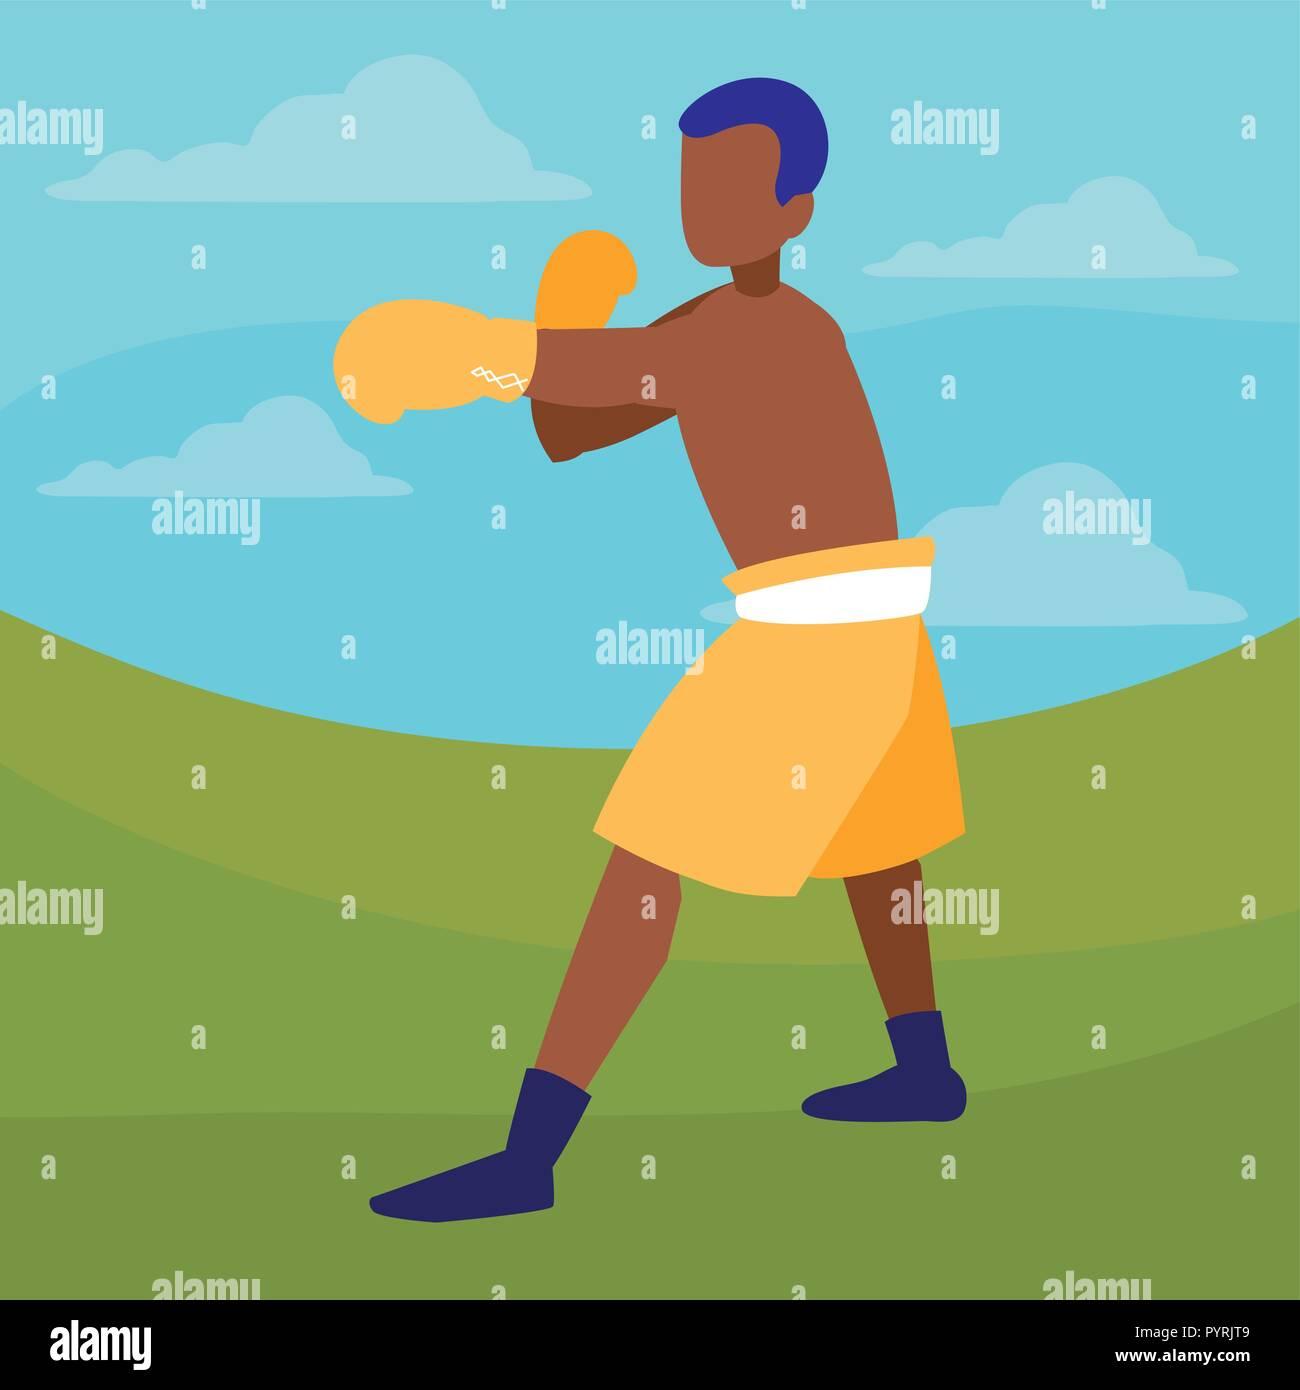 boxer training avatar character vector illustration design - Stock Image